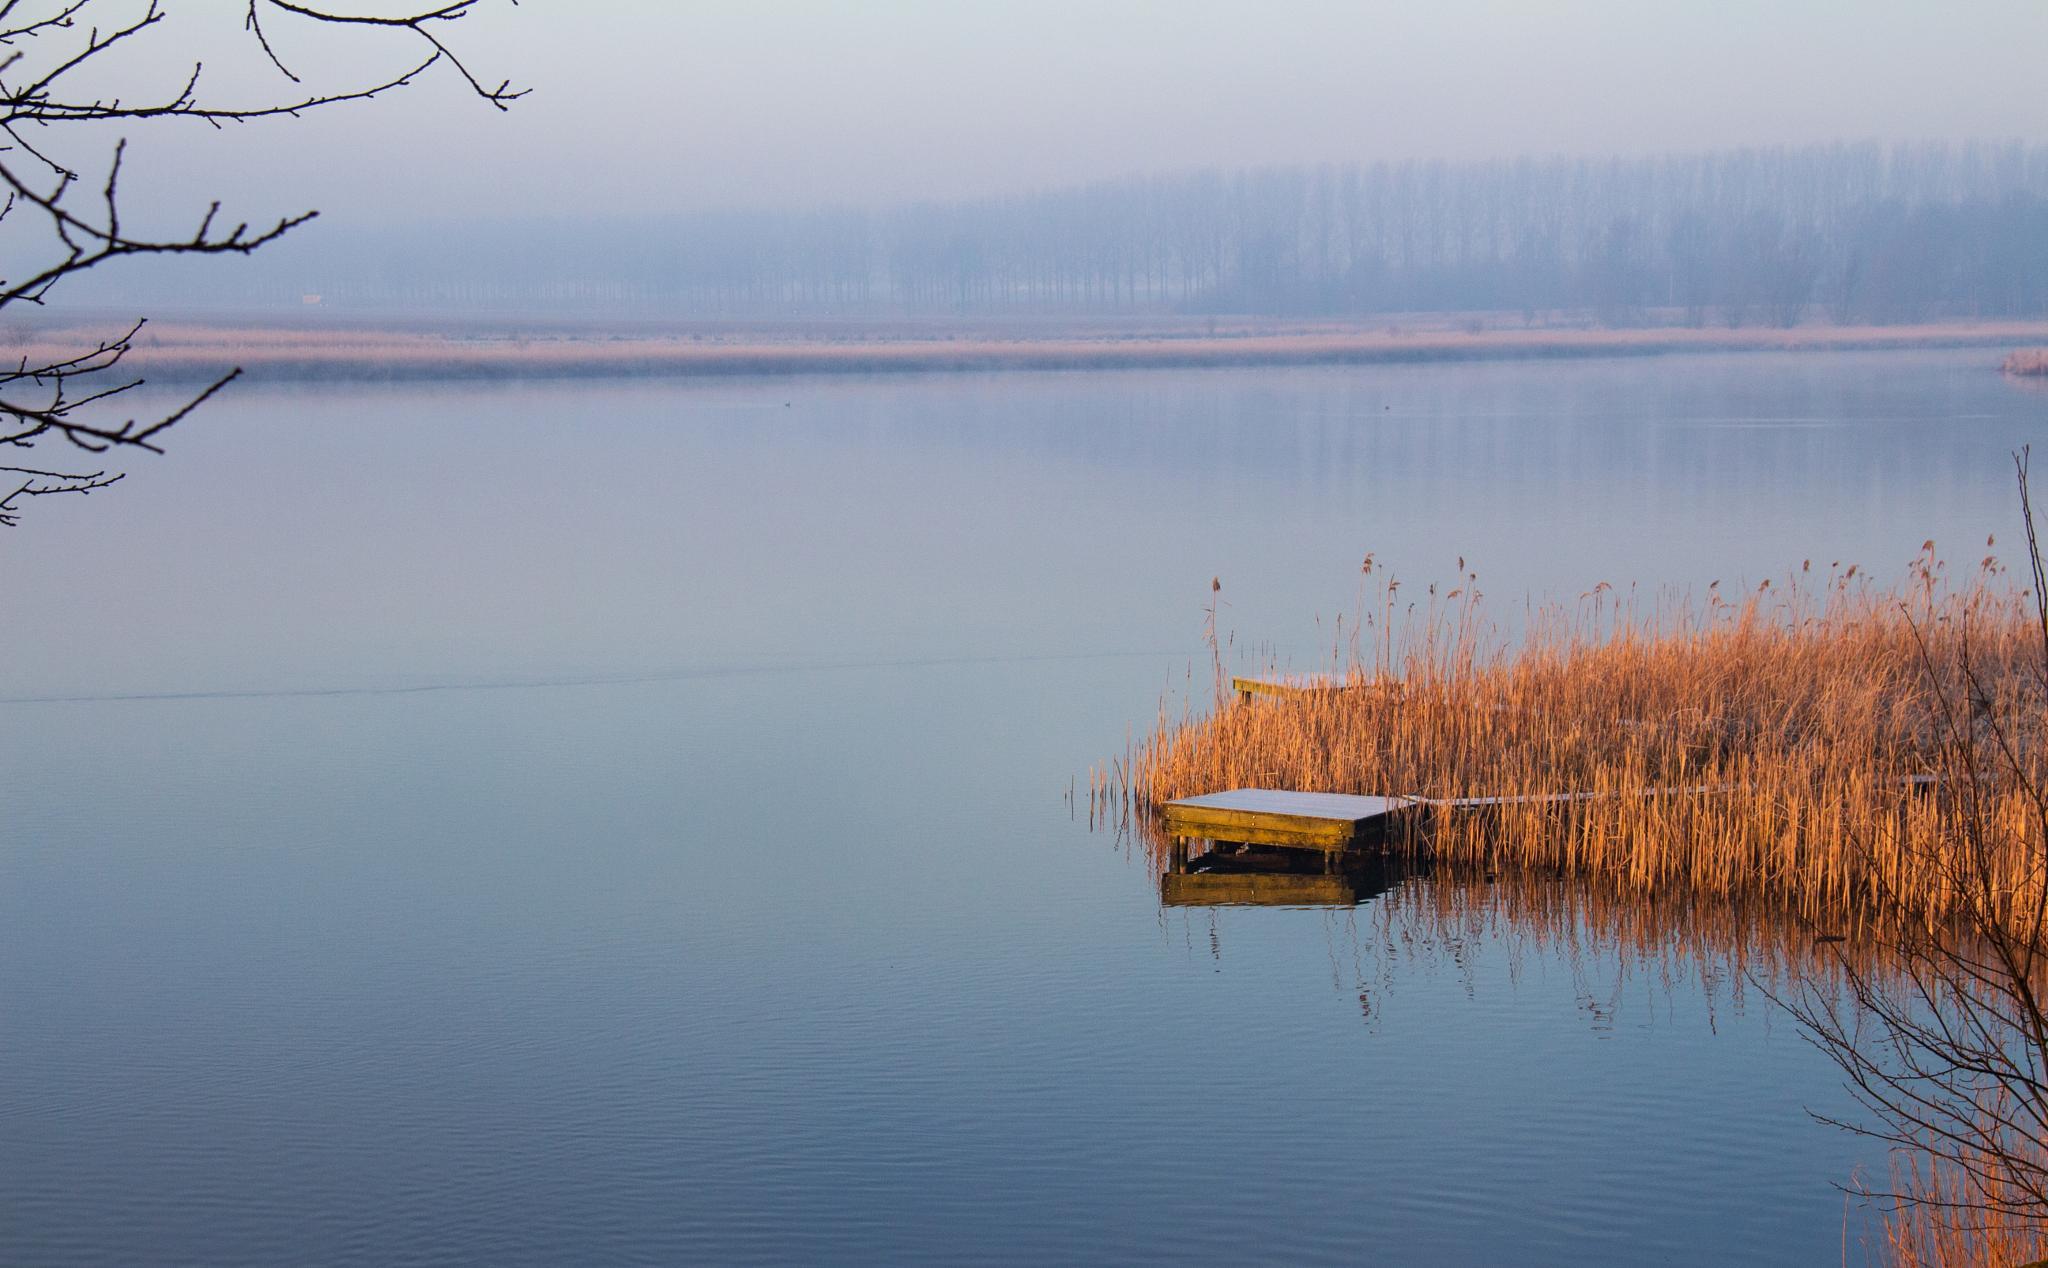 winter by Tineke.Hemelsoet-Markenhof